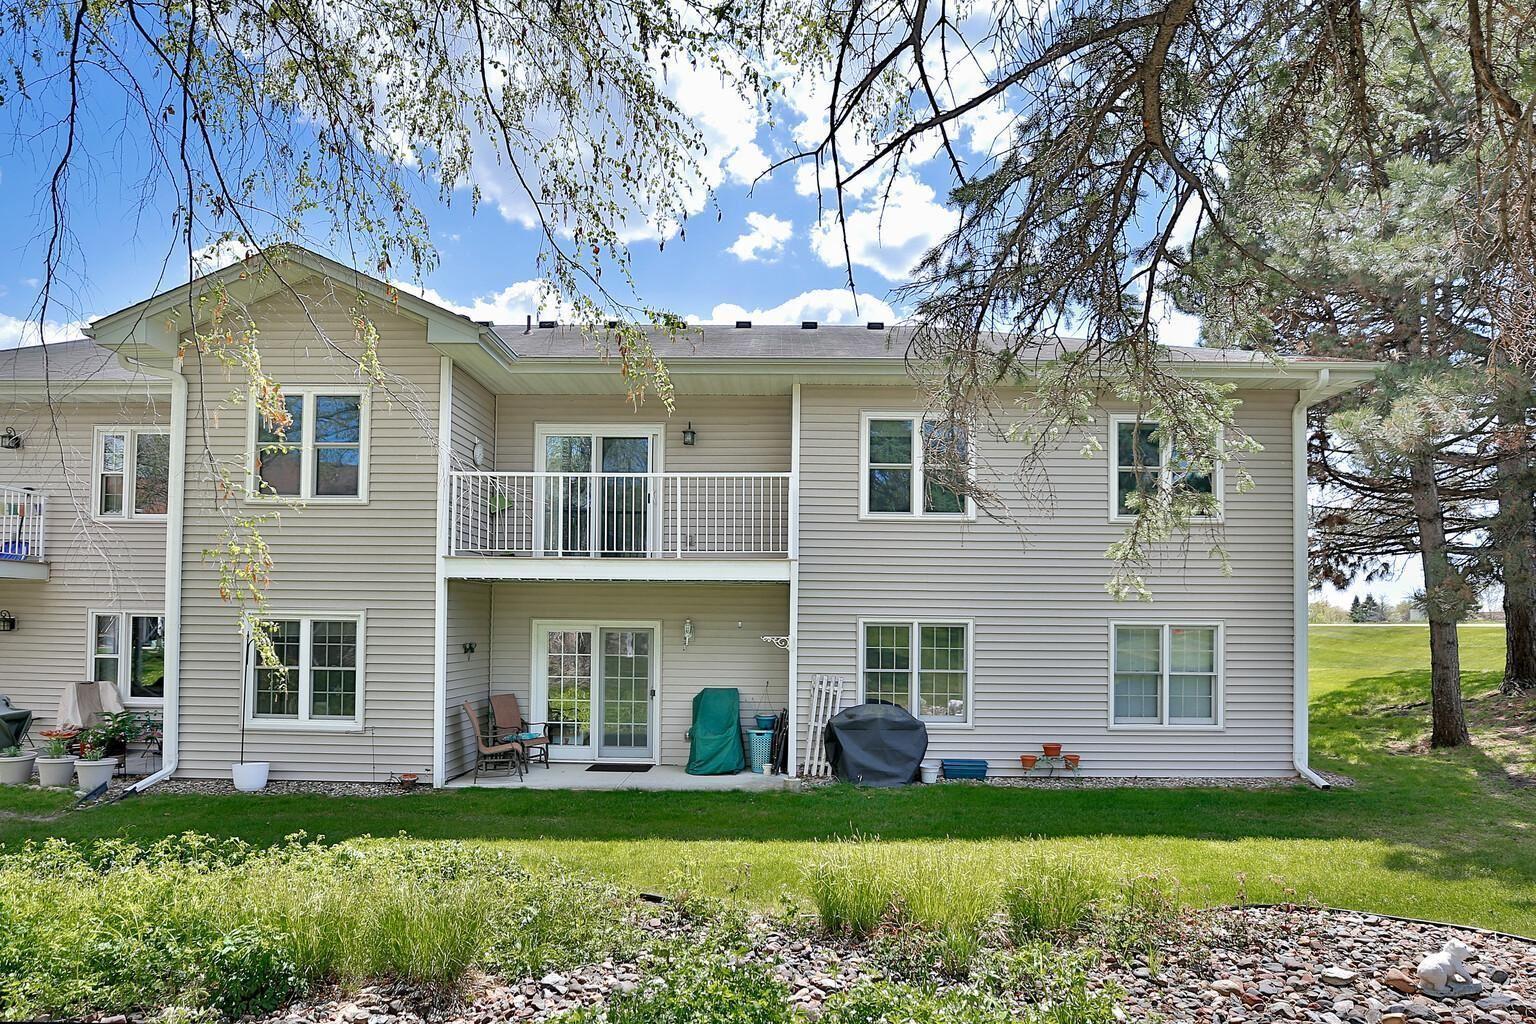 1785 COUNTY RD. E EAST #15, White Bear Lake, MN 55110 - MLS#: 5755389